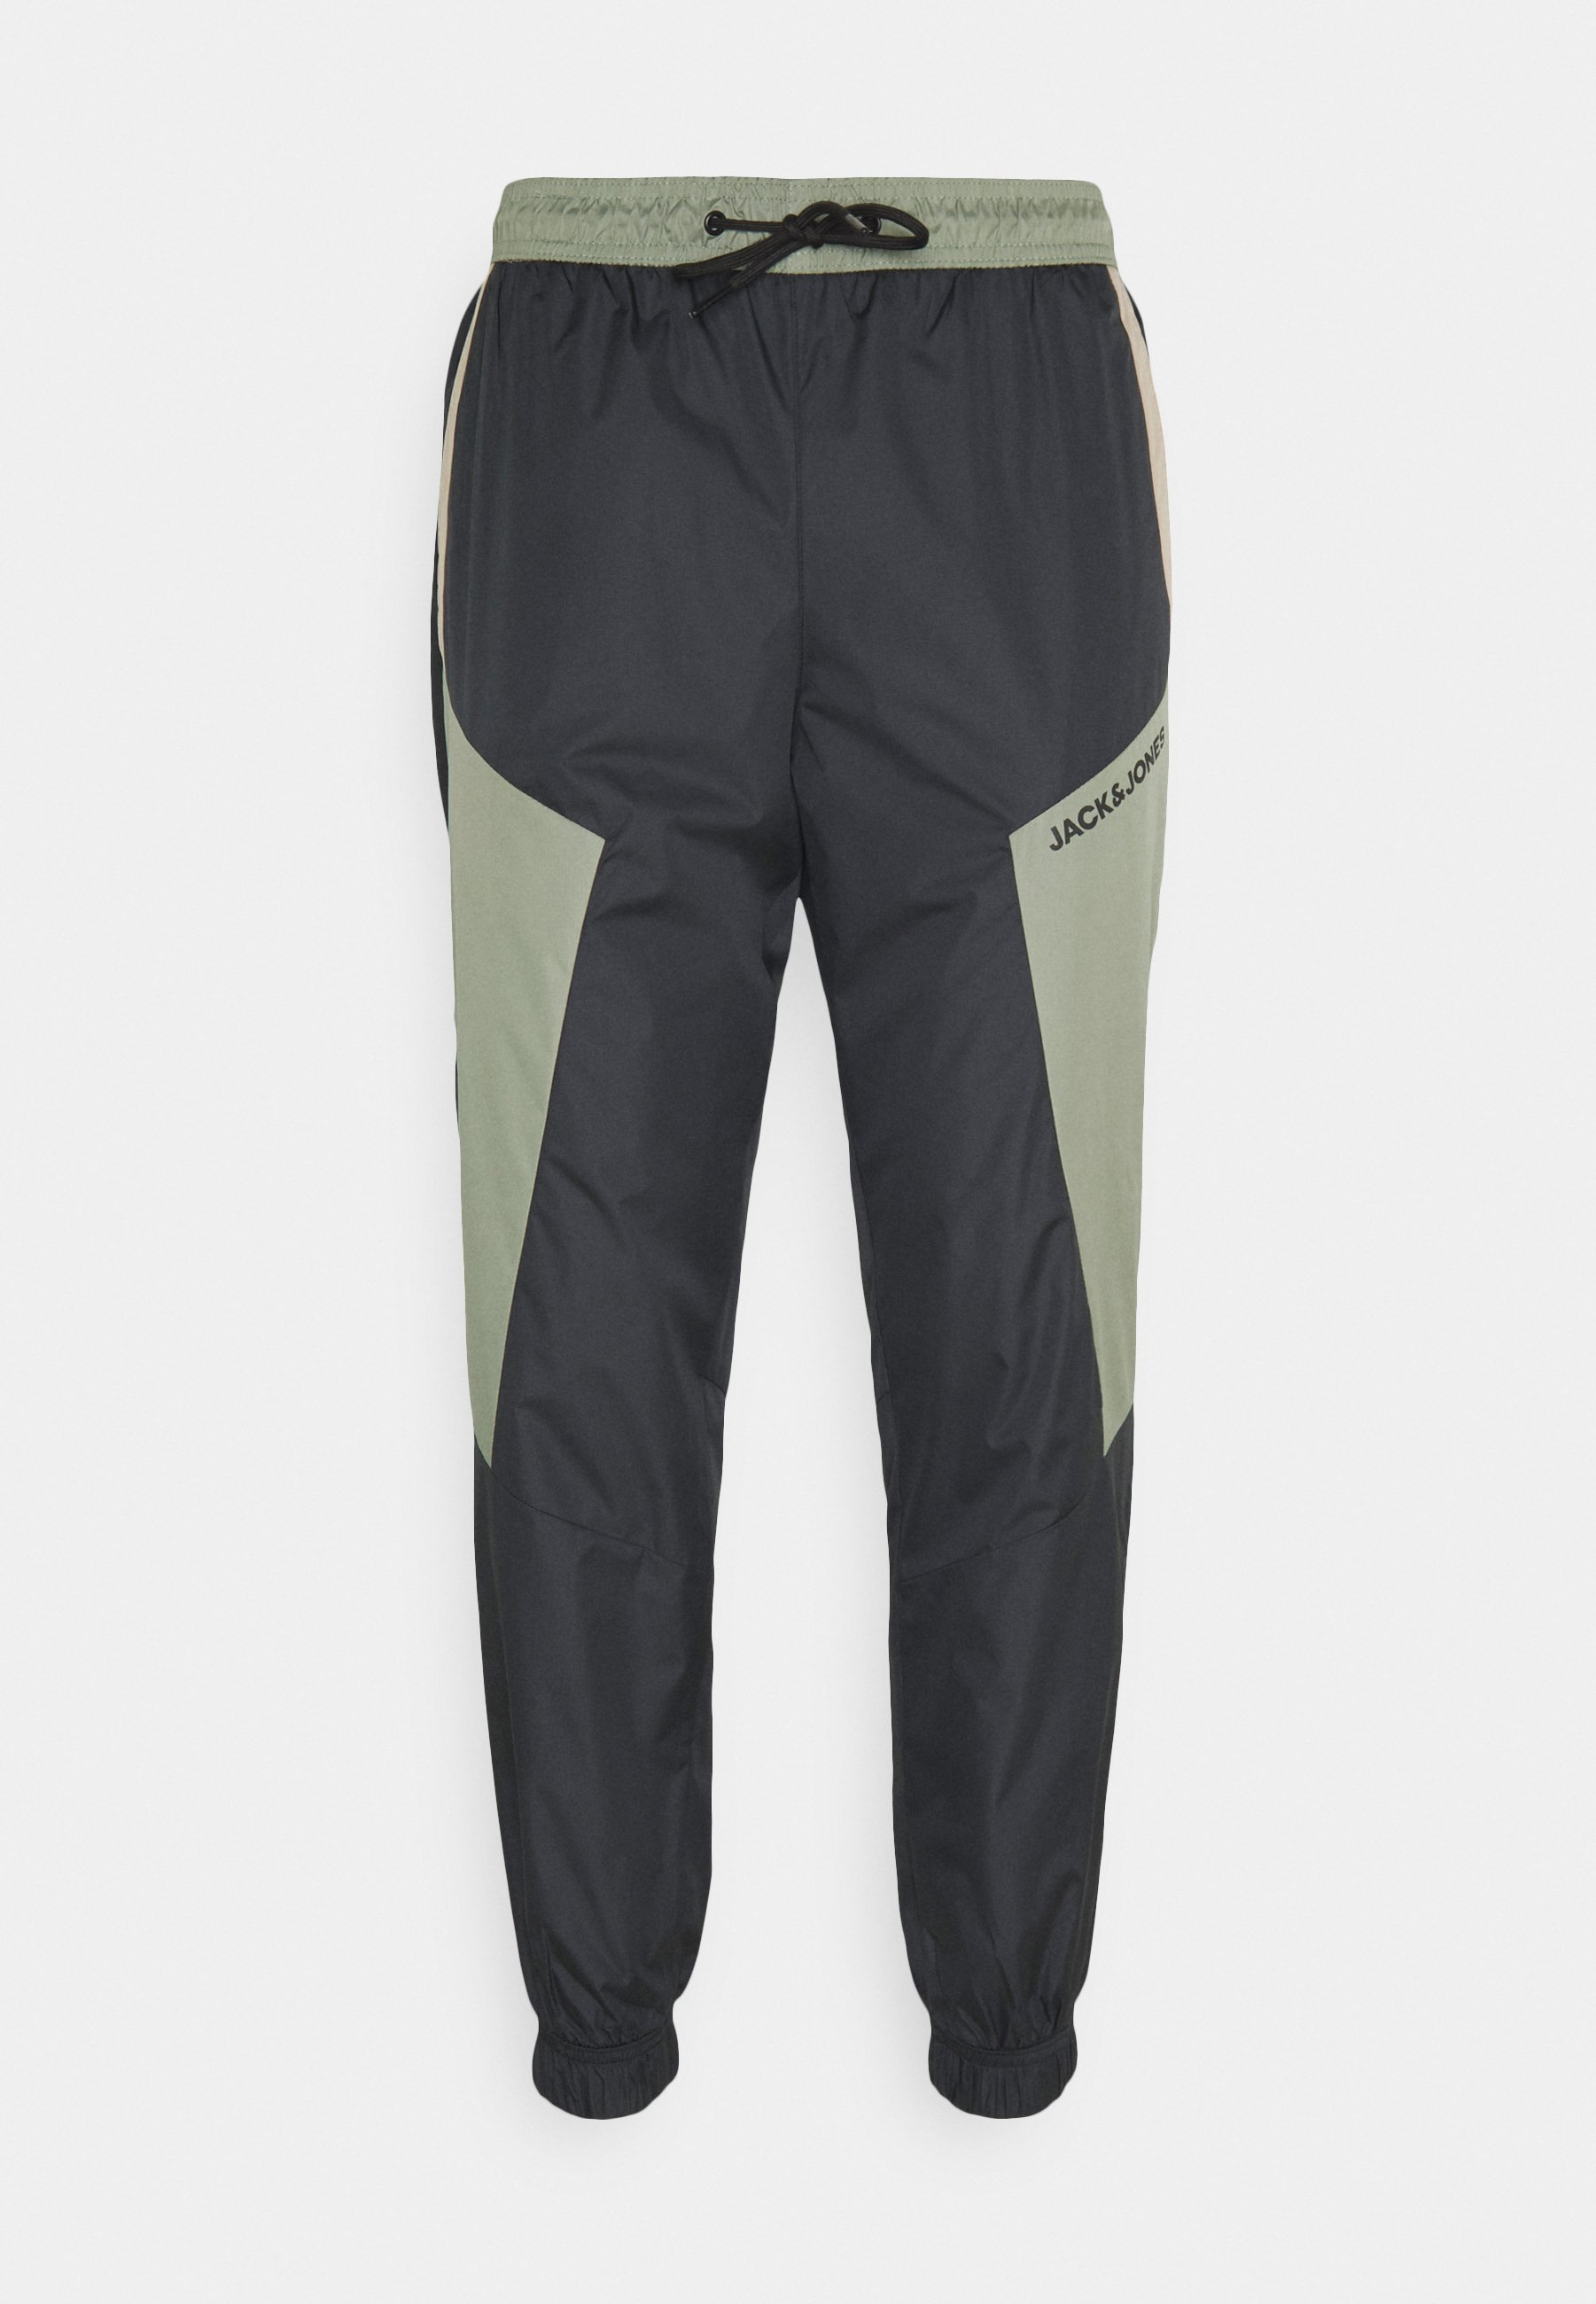 Homme JJIACE JJRODMAN TRACK PANTS - Pantalon de survêtement